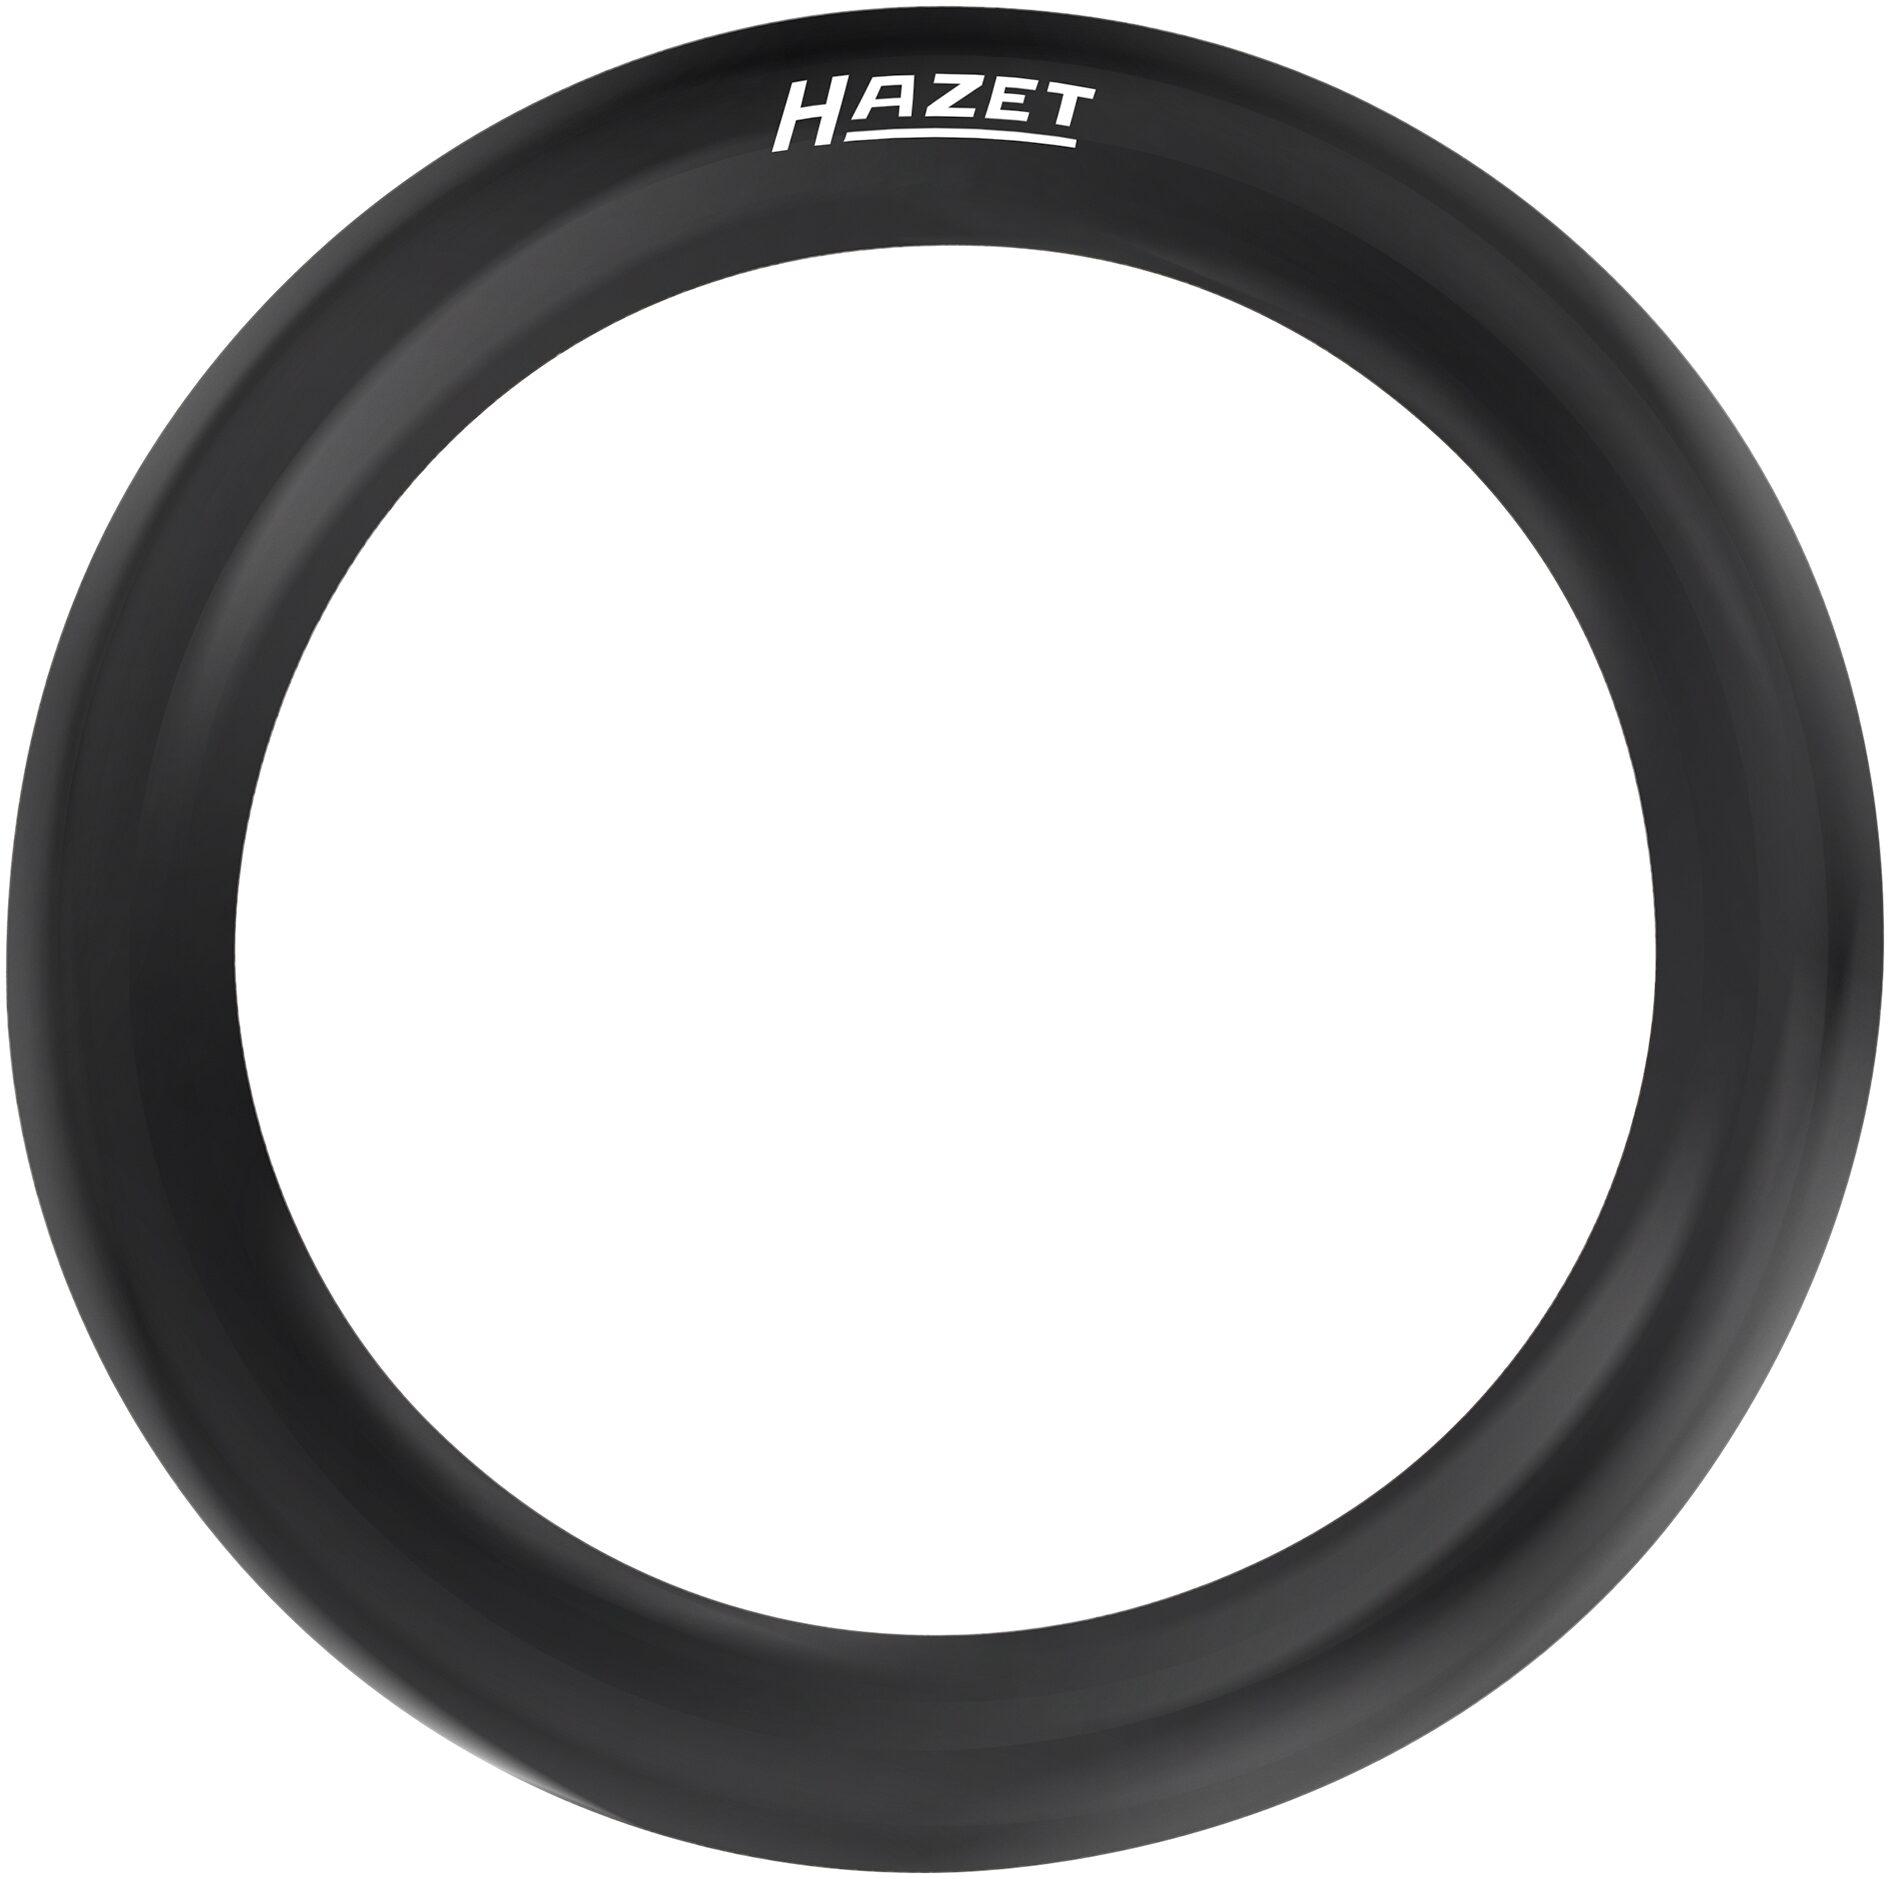 HAZET O-Ring 1100S-G2260 ∙ Vierkant massiv 25 mm (1 Zoll) ∙ ∅ 45x7